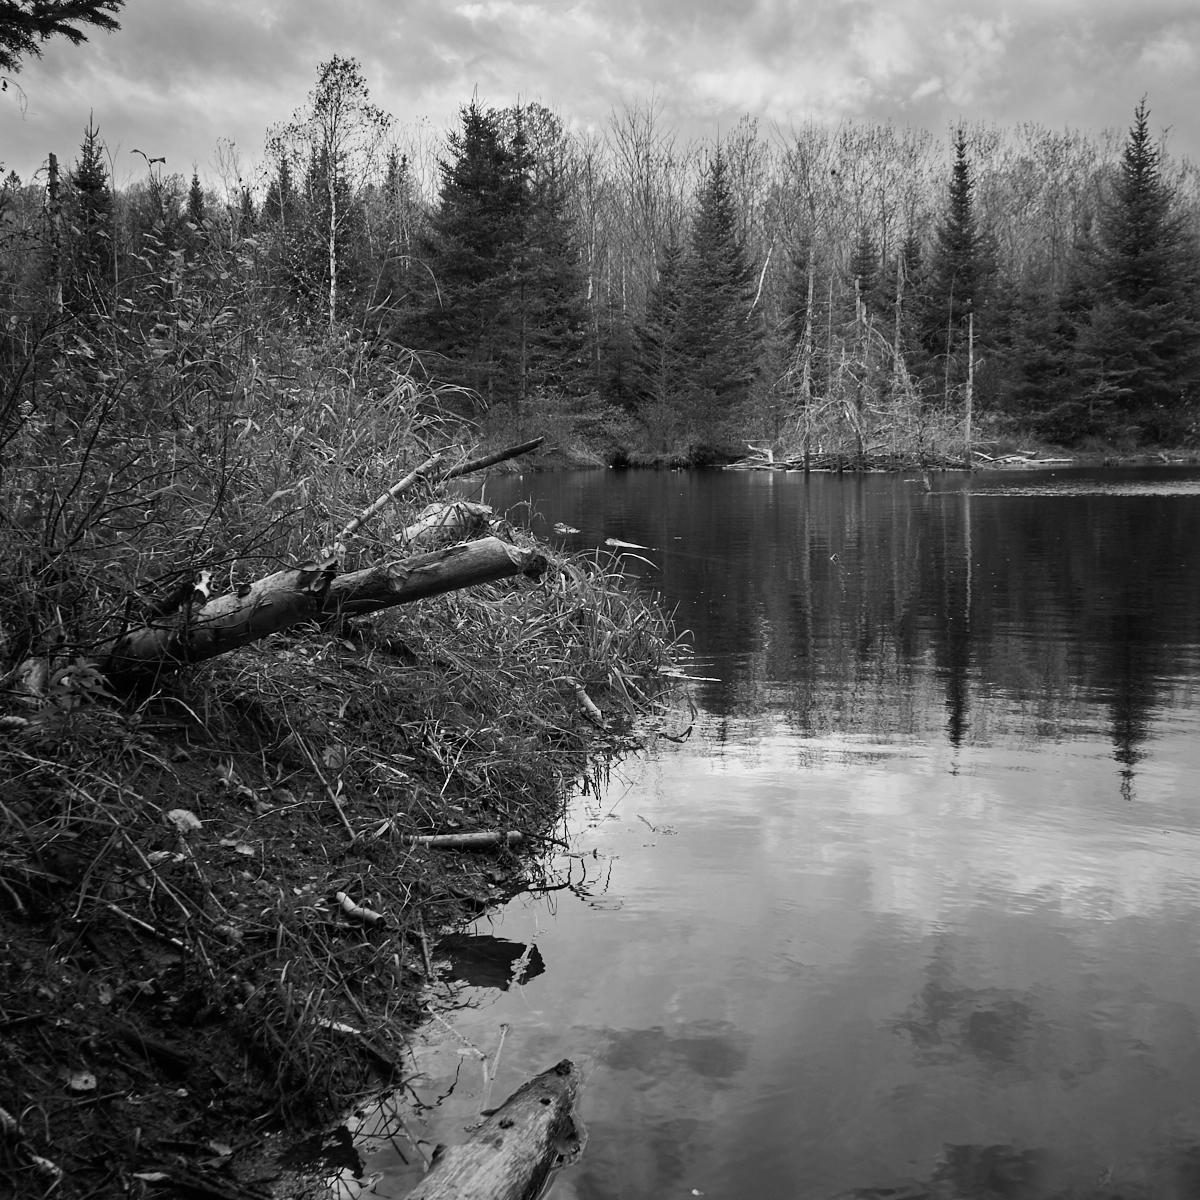 Beaver lodge and dam La Mauricie1600x1200 sRGB.jpg